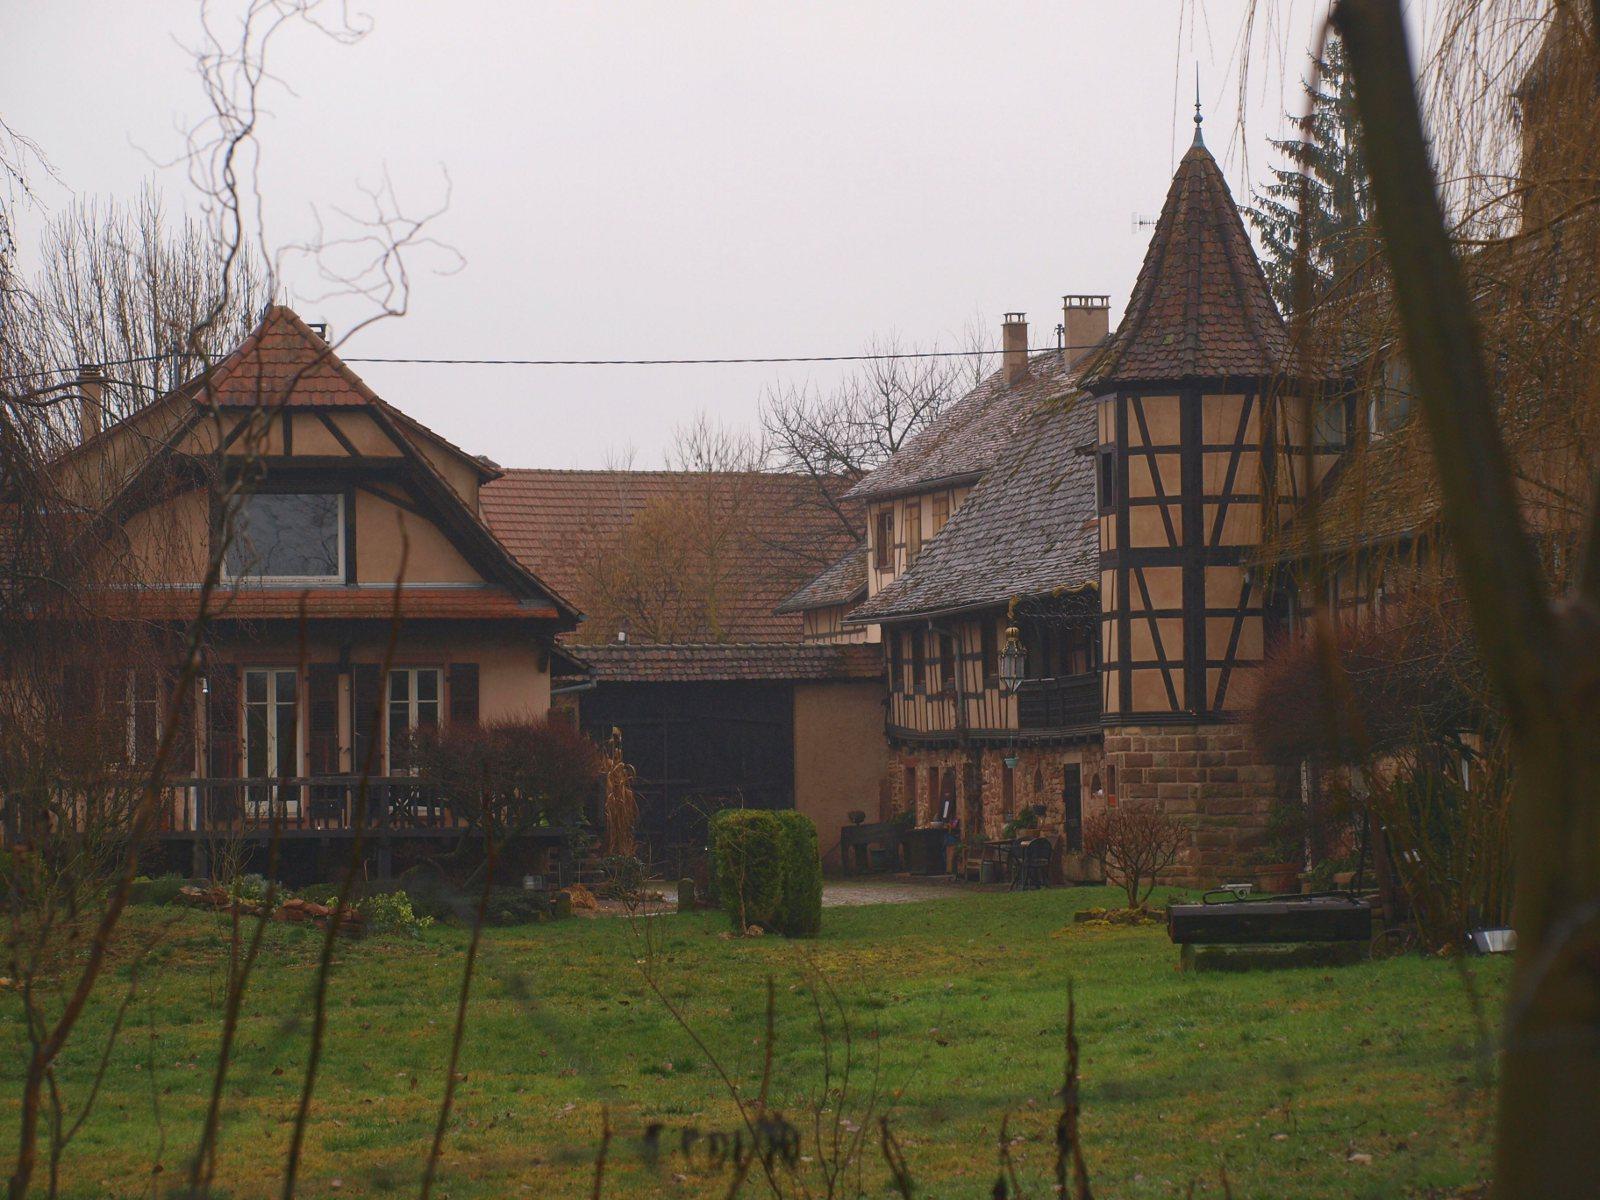 Meublé de tourisme La Tourelle de Mithra - Katzele (Neugartheim Ittlenheim)